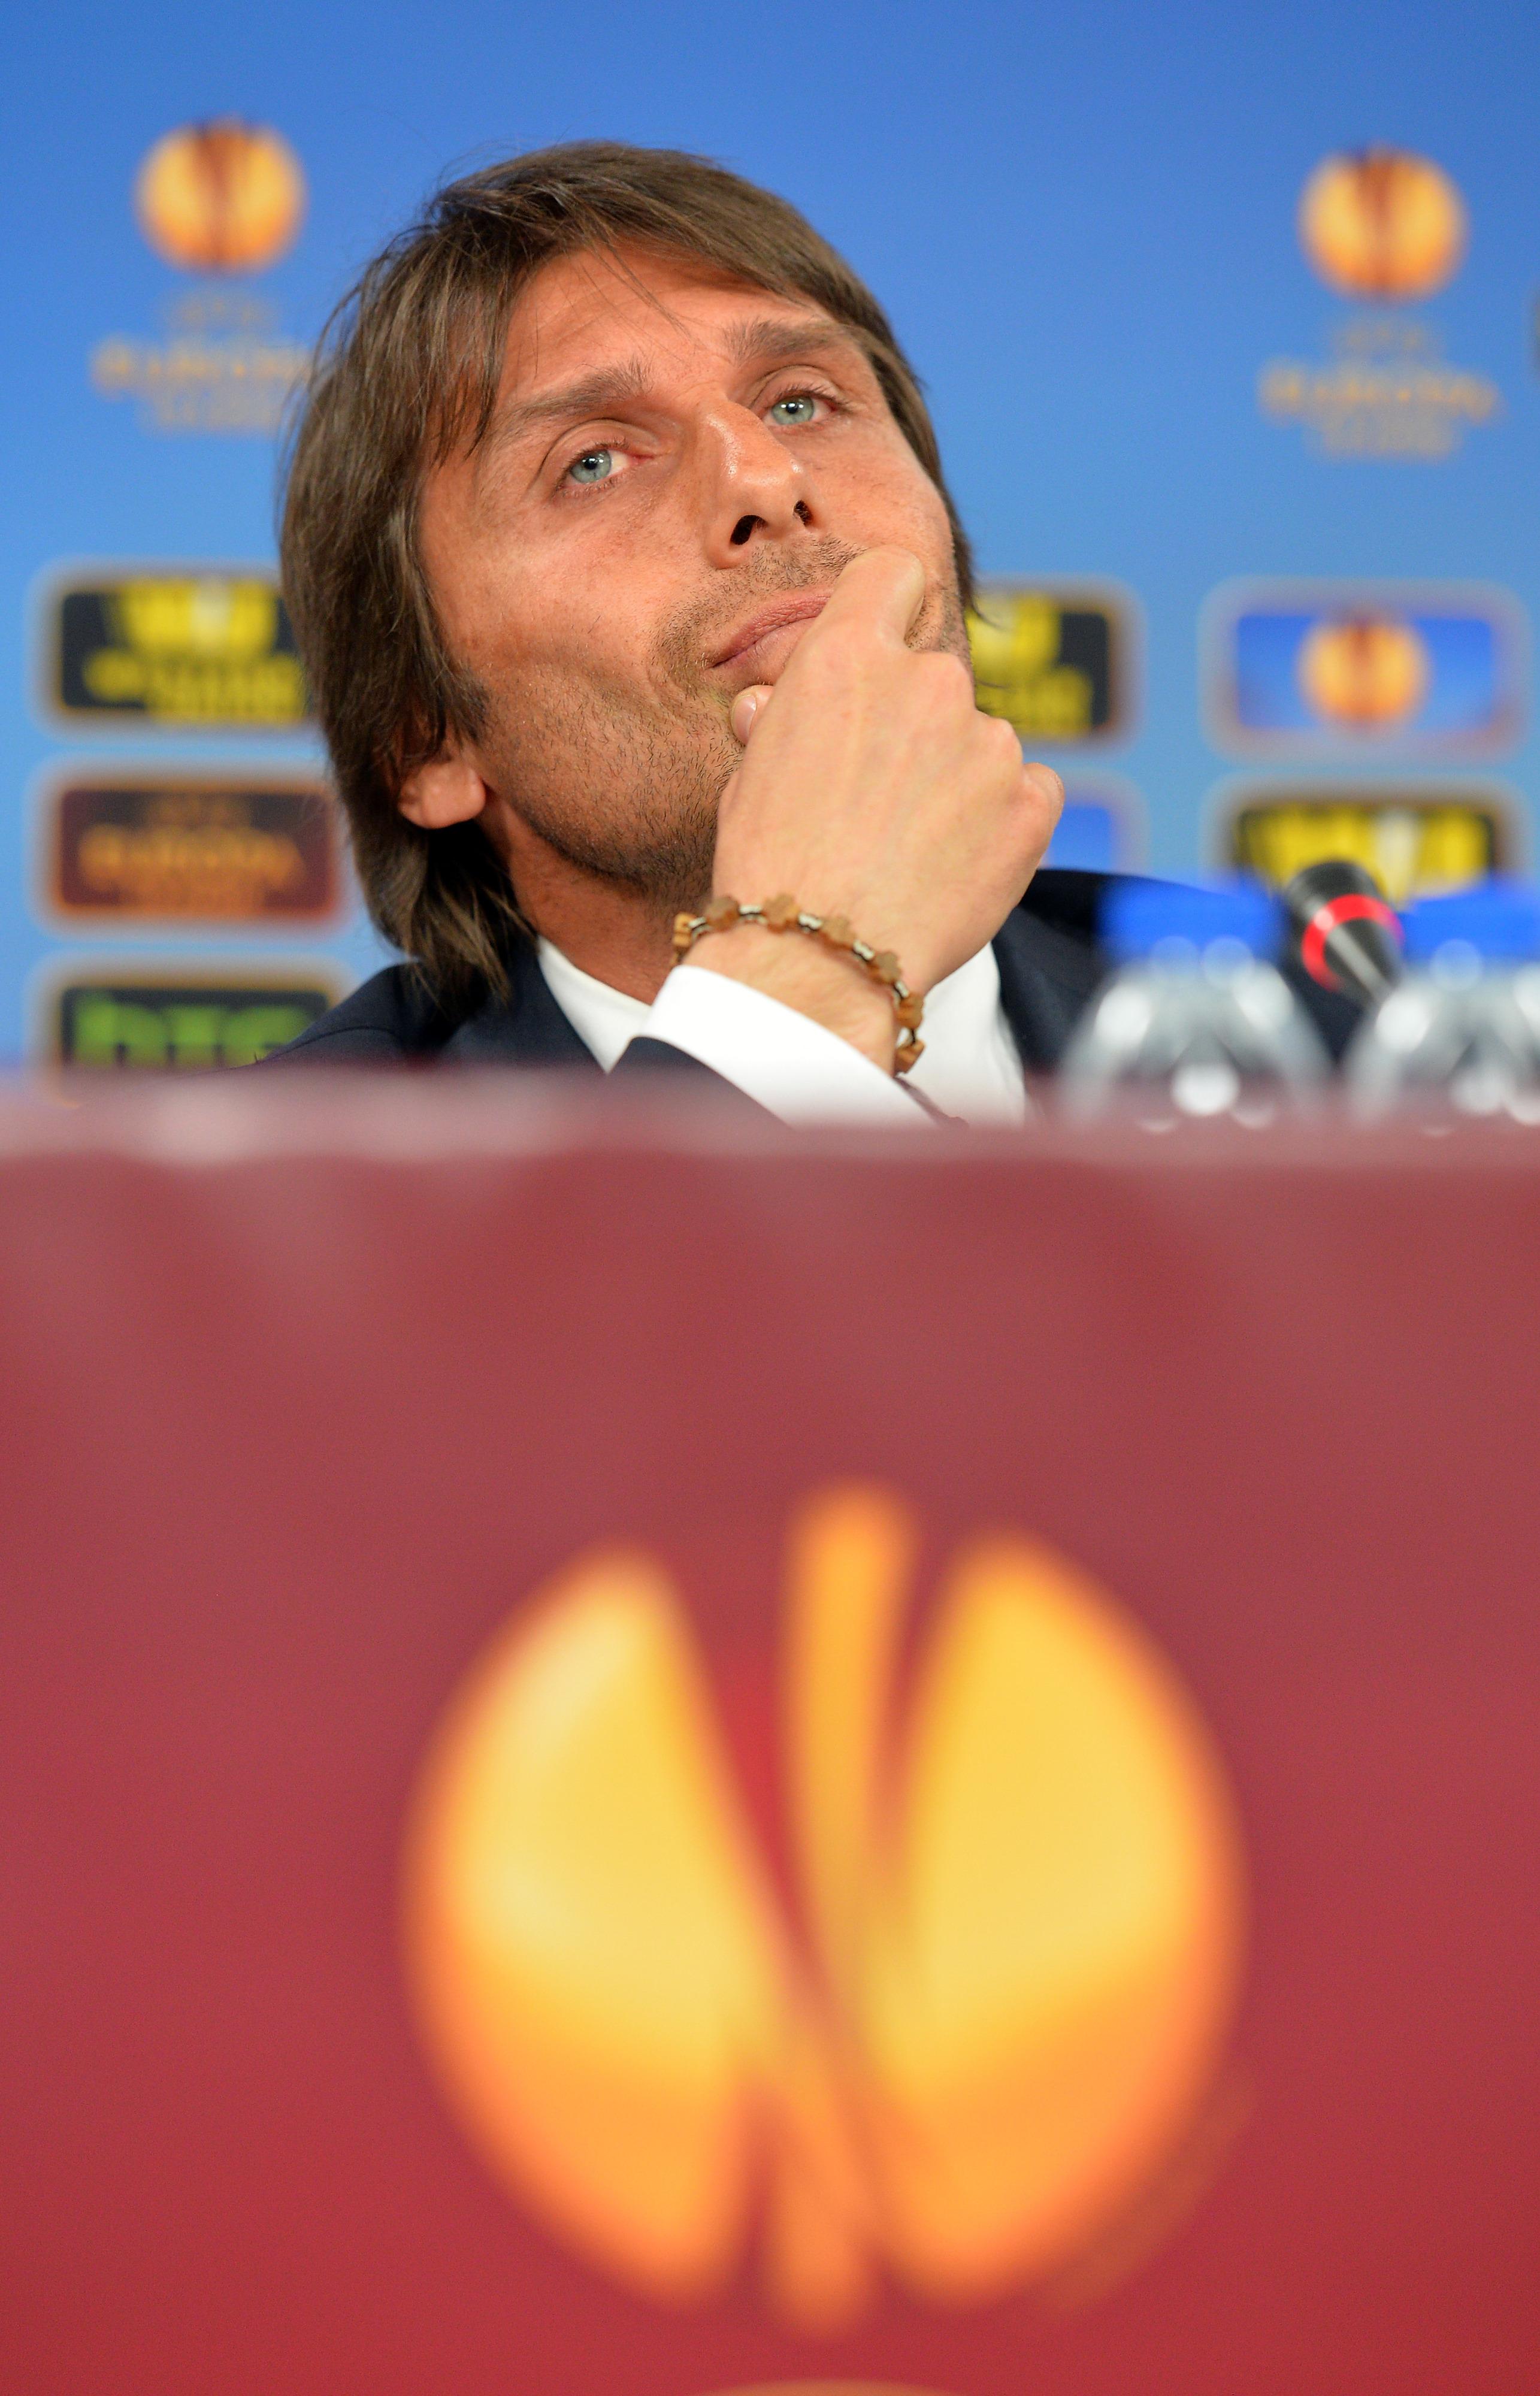 Antonio Conte: Thinking man.